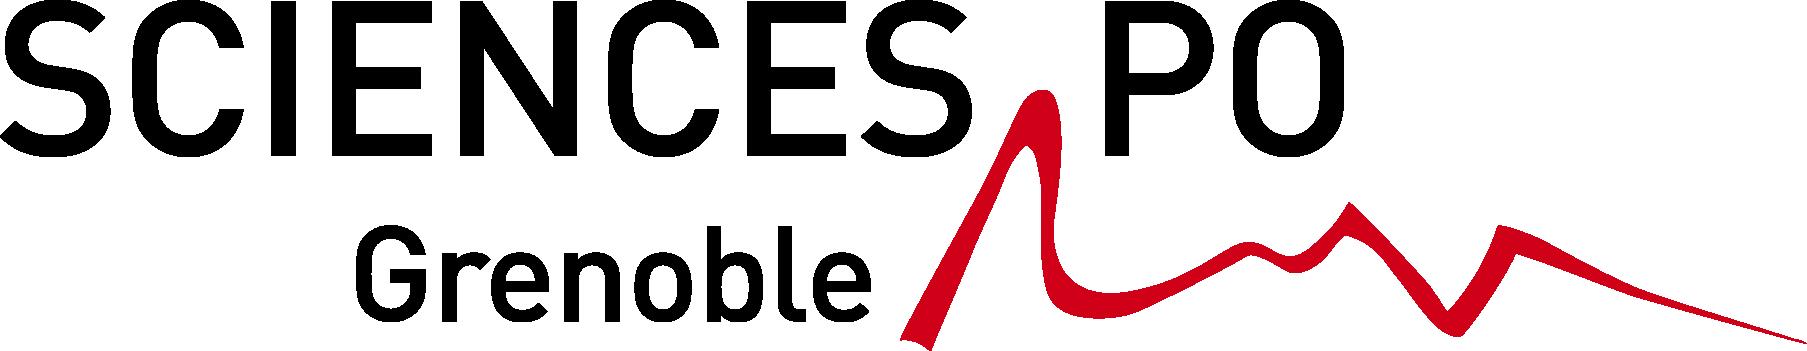 Logo de l'IEPG